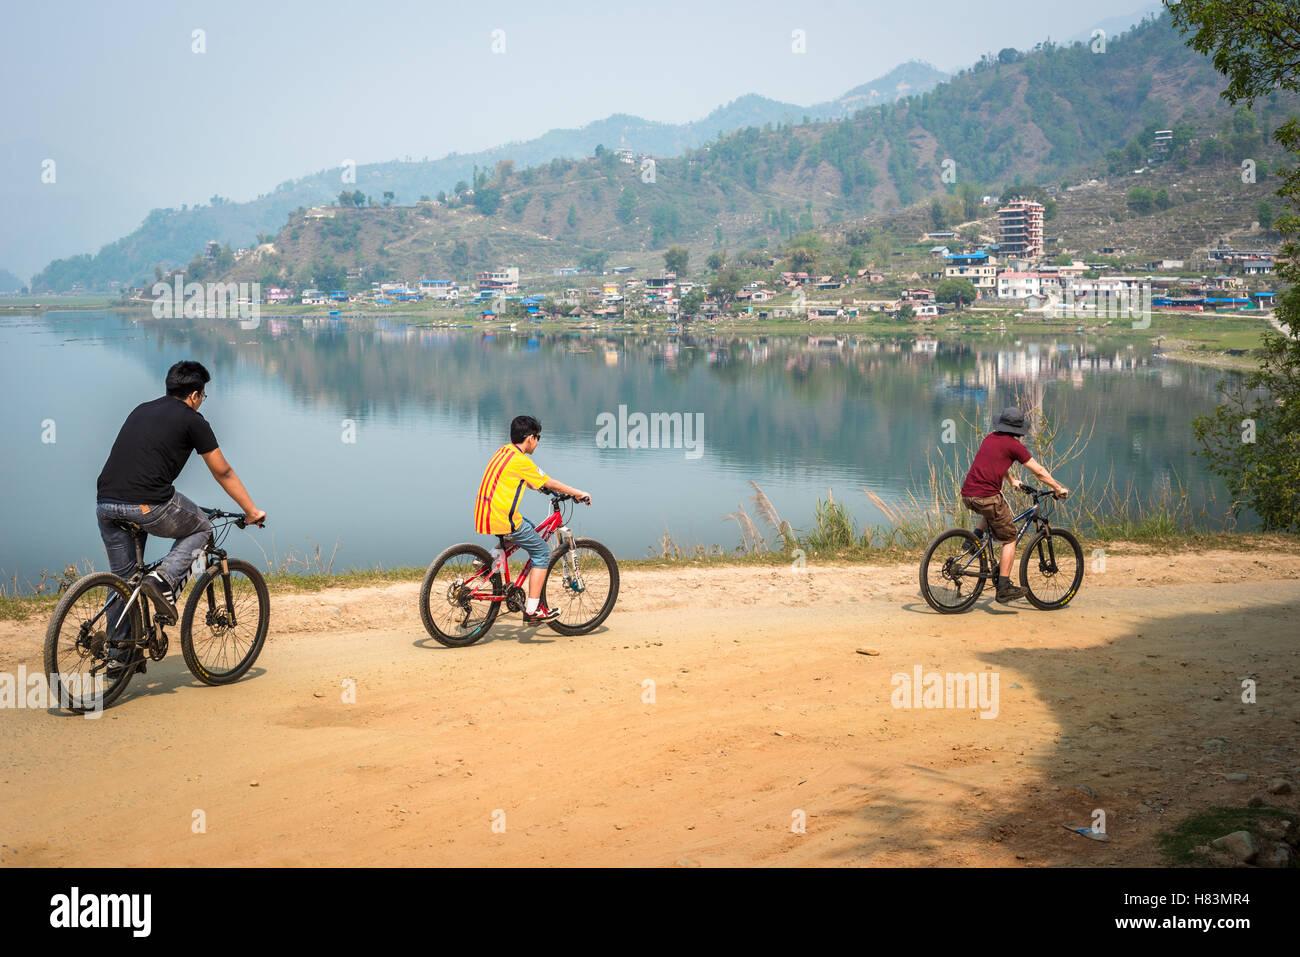 Family ride bicycles along Phewa lakeside near Pokhara, Kaski district, Nepal. © Reynold Sumayku - Stock Image